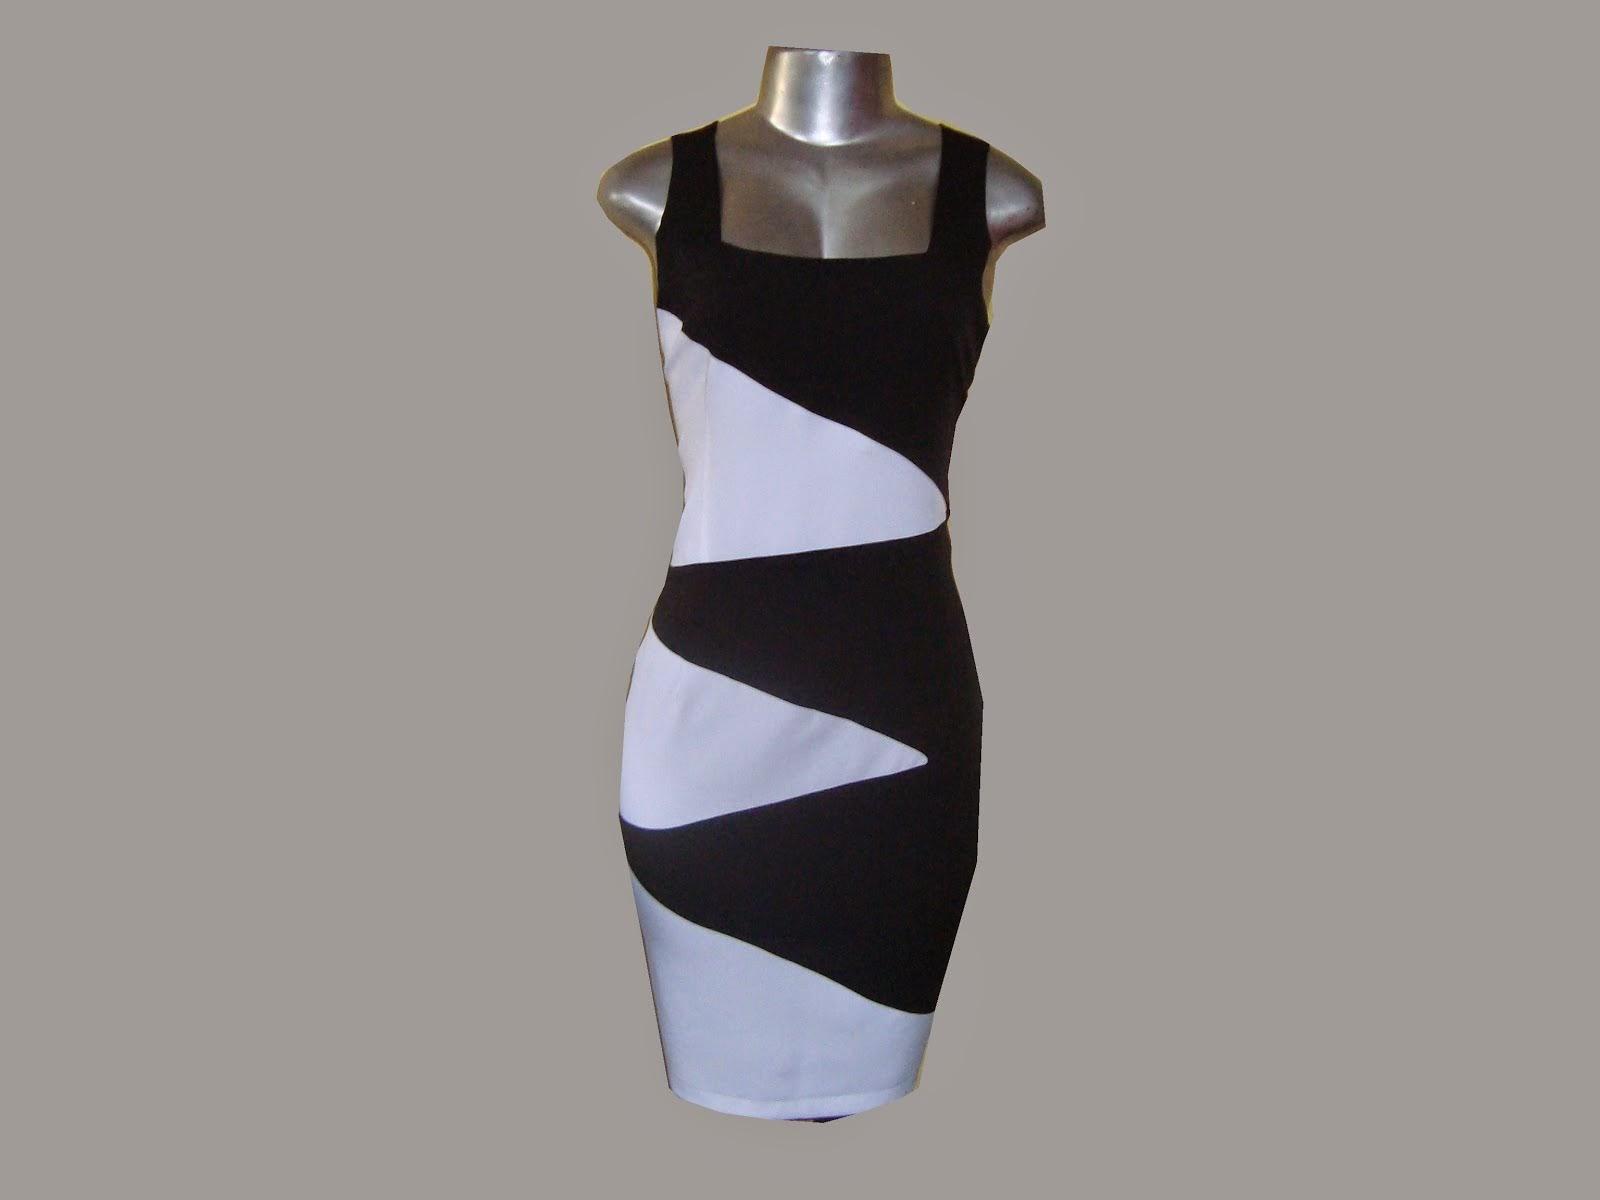 vestido tubinho de prada preto e branco